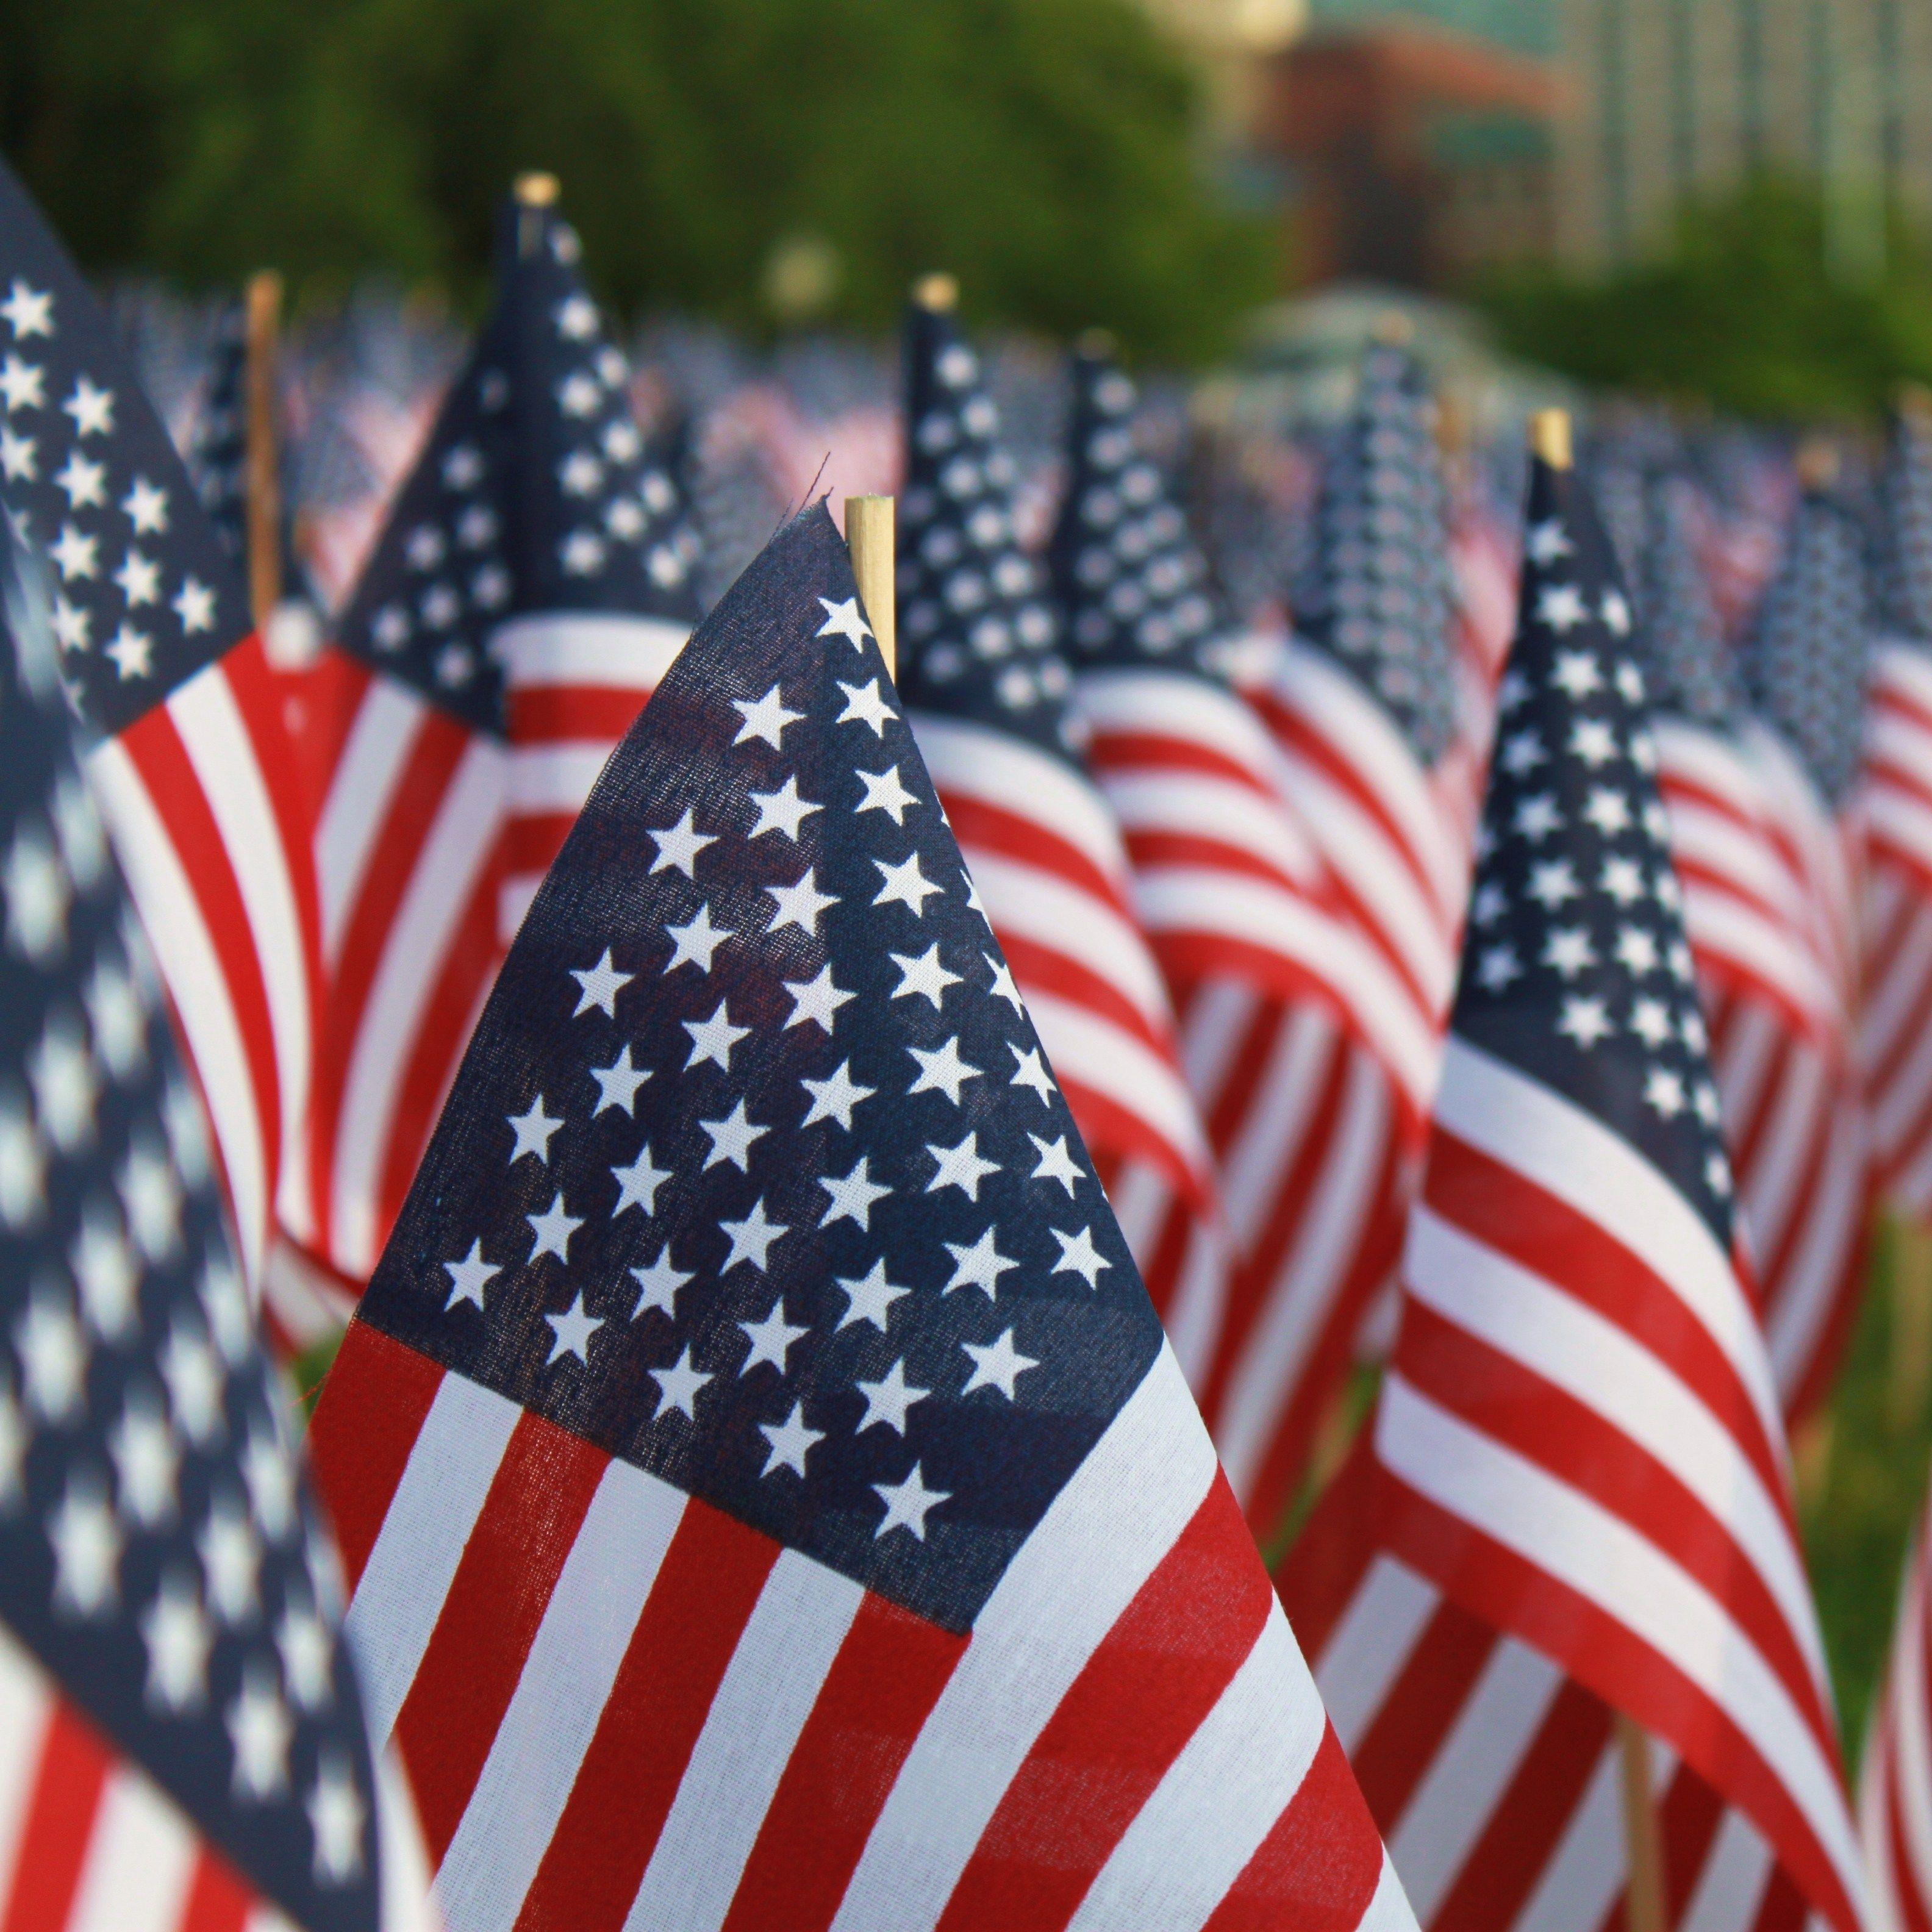 American flags shutterstock 400129342 nj8u4q